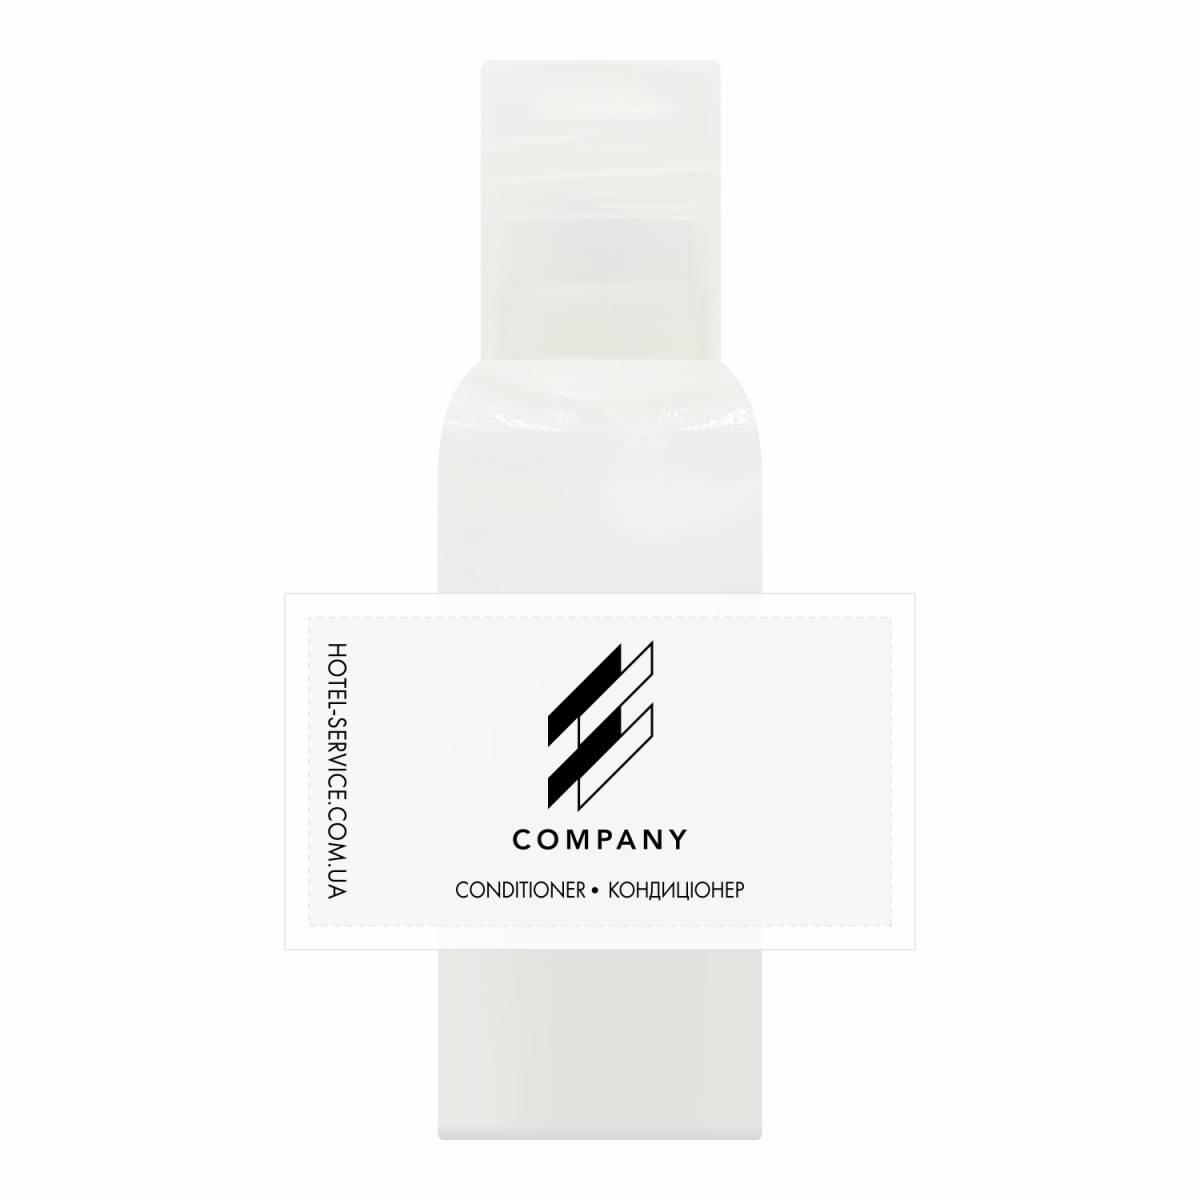 Кондиционер для волос 30 мл с логотипом заказчика CR/B30-L HSG